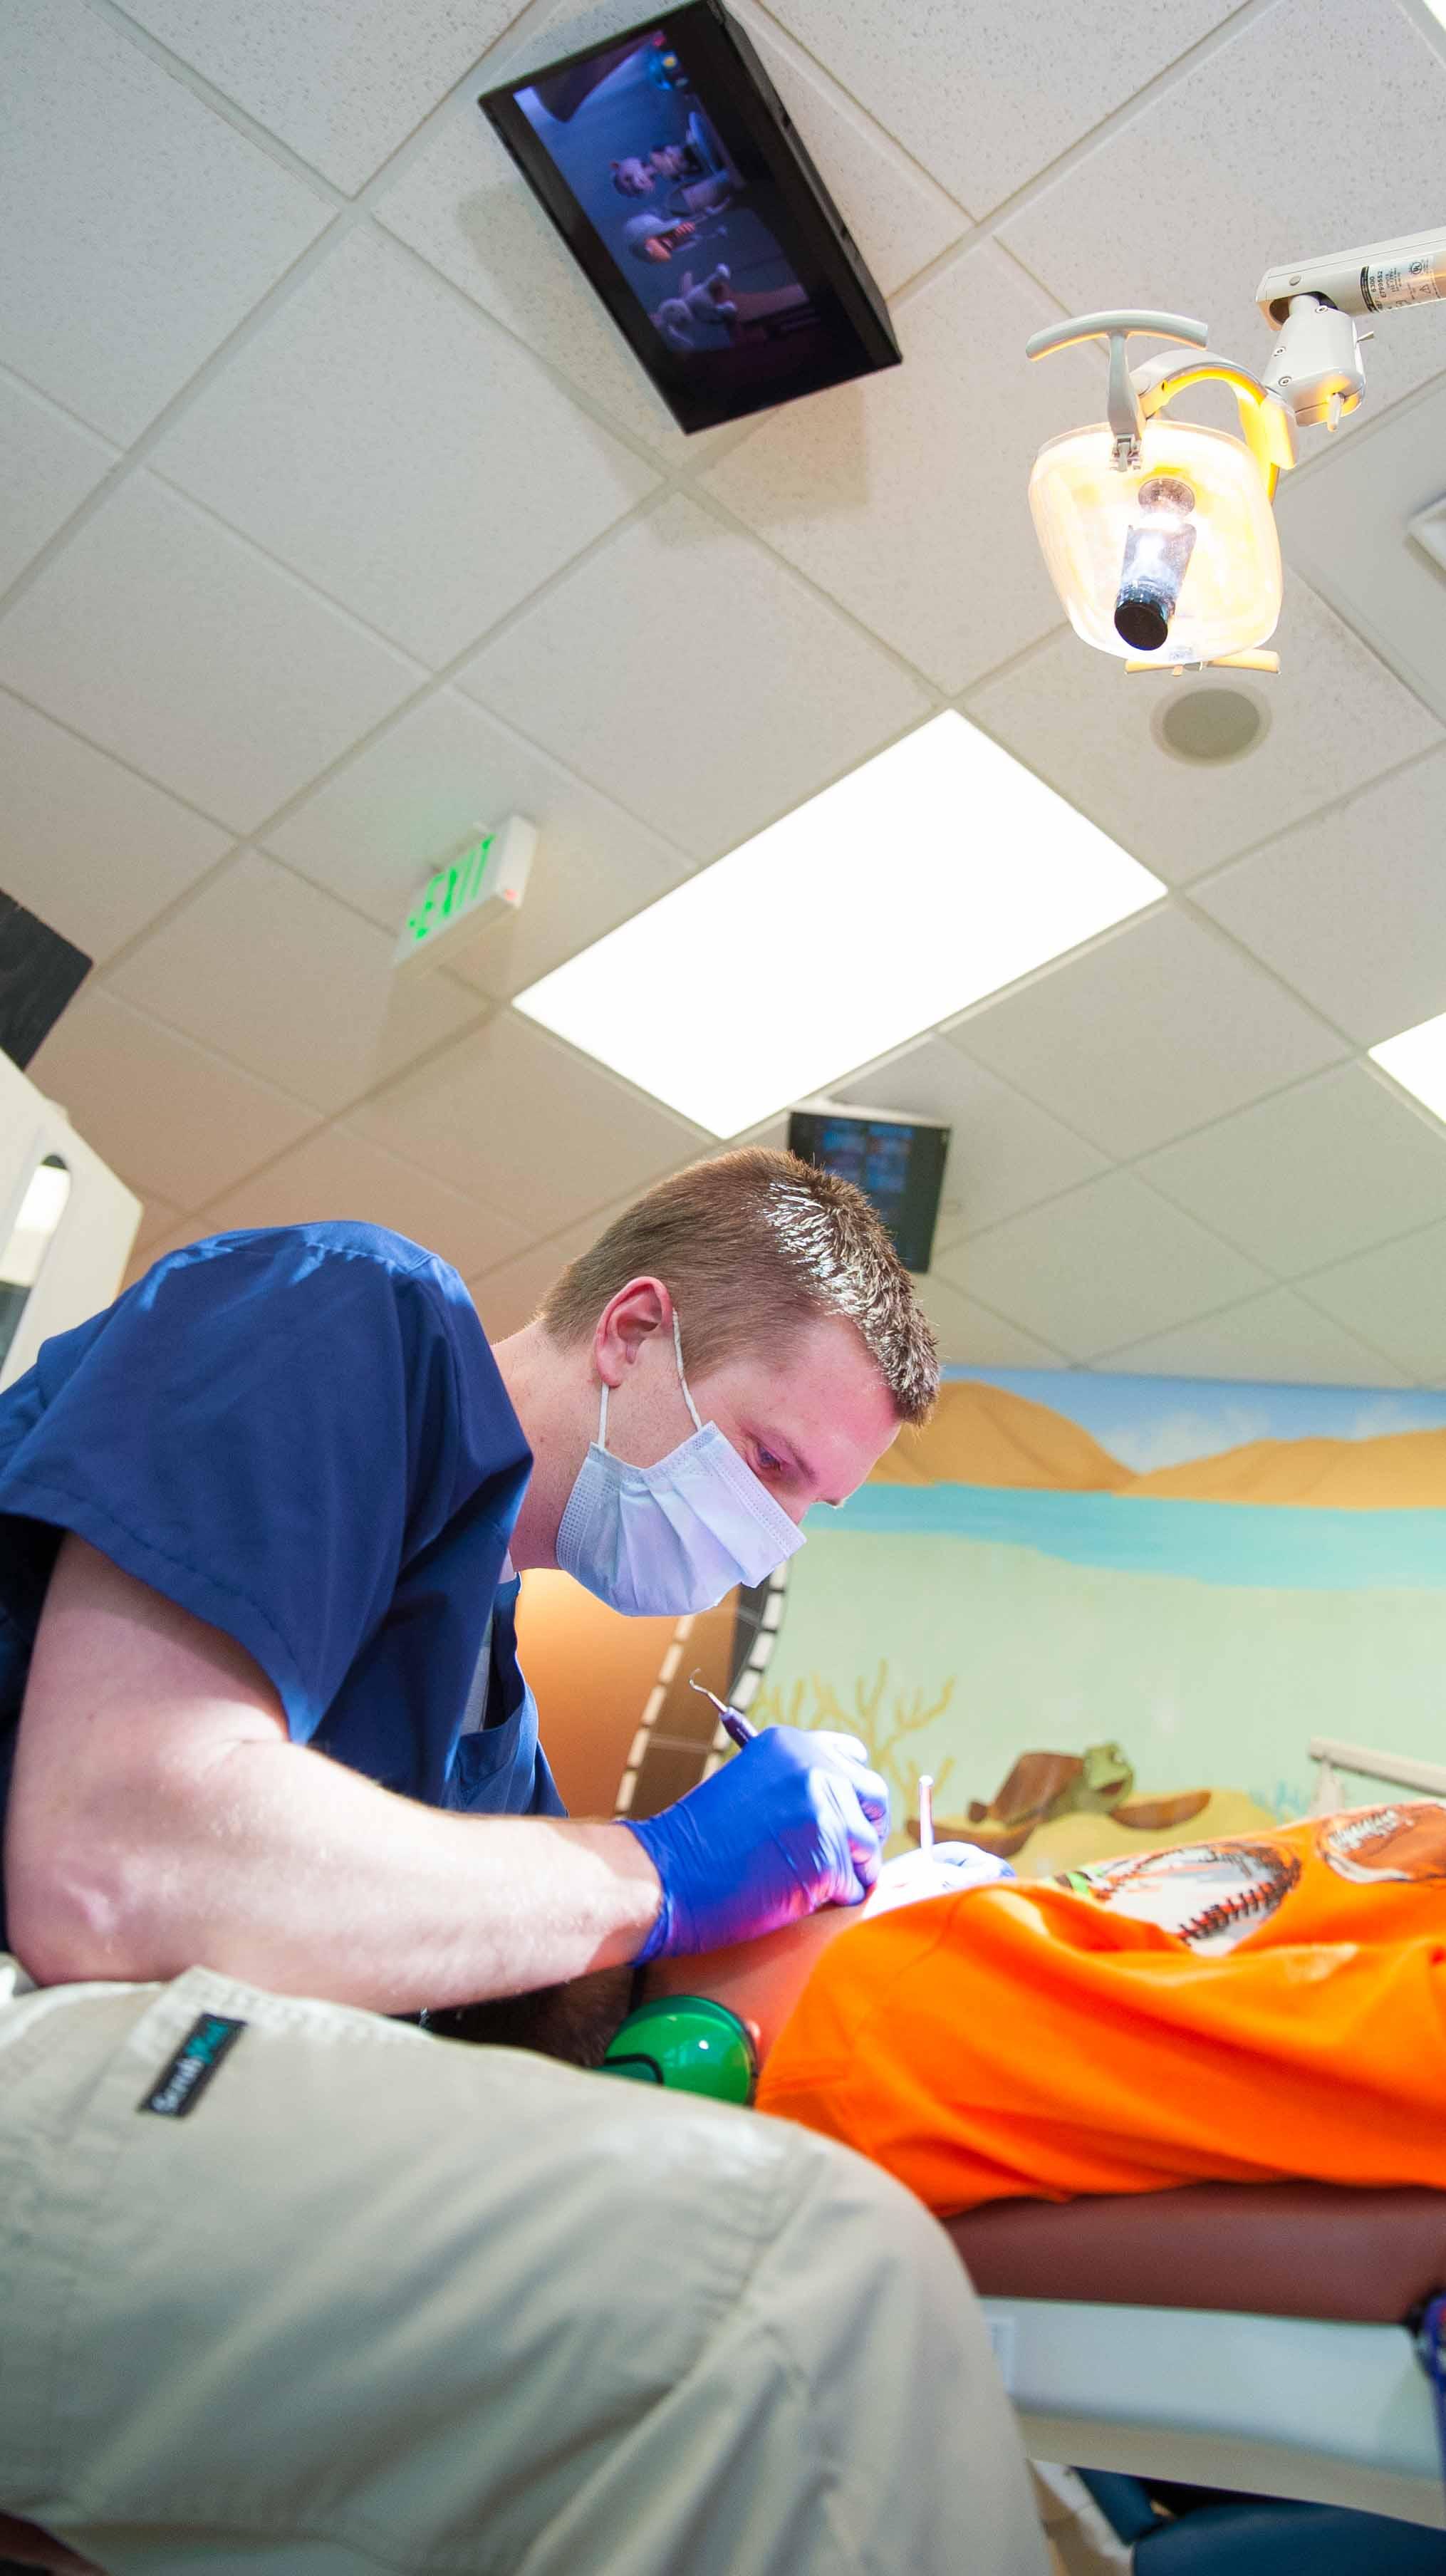 Advanced Pediatric Dentistry Pasco hermiston kids Dentist and orthodontist braces care pediatric children walla walla Tri-cities tricities richmond hermiston pasco Kennewick-84.jpg